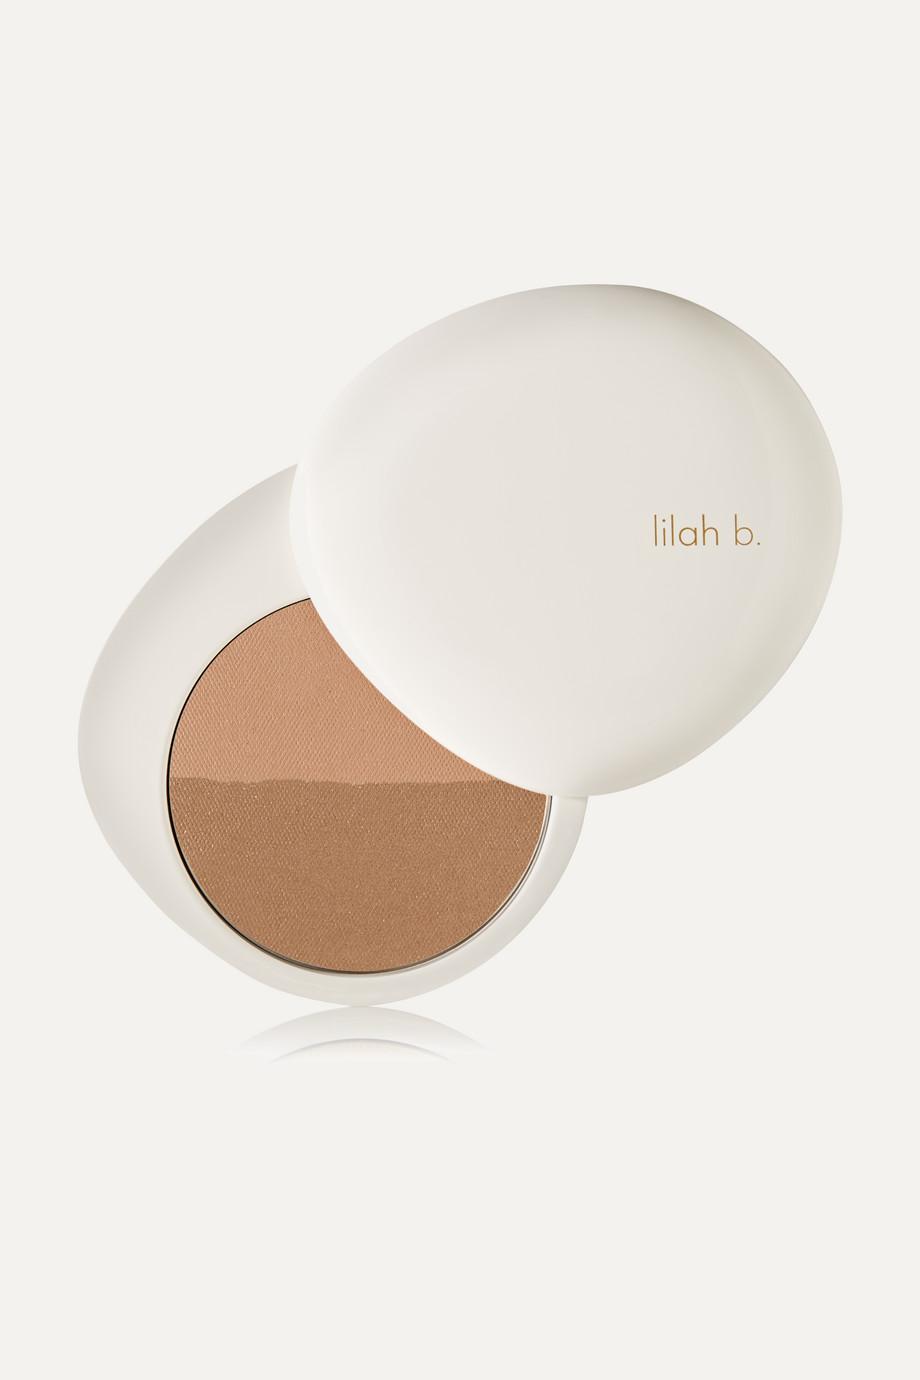 Lilah B. Bronzed Beauty - b. sun-kissed